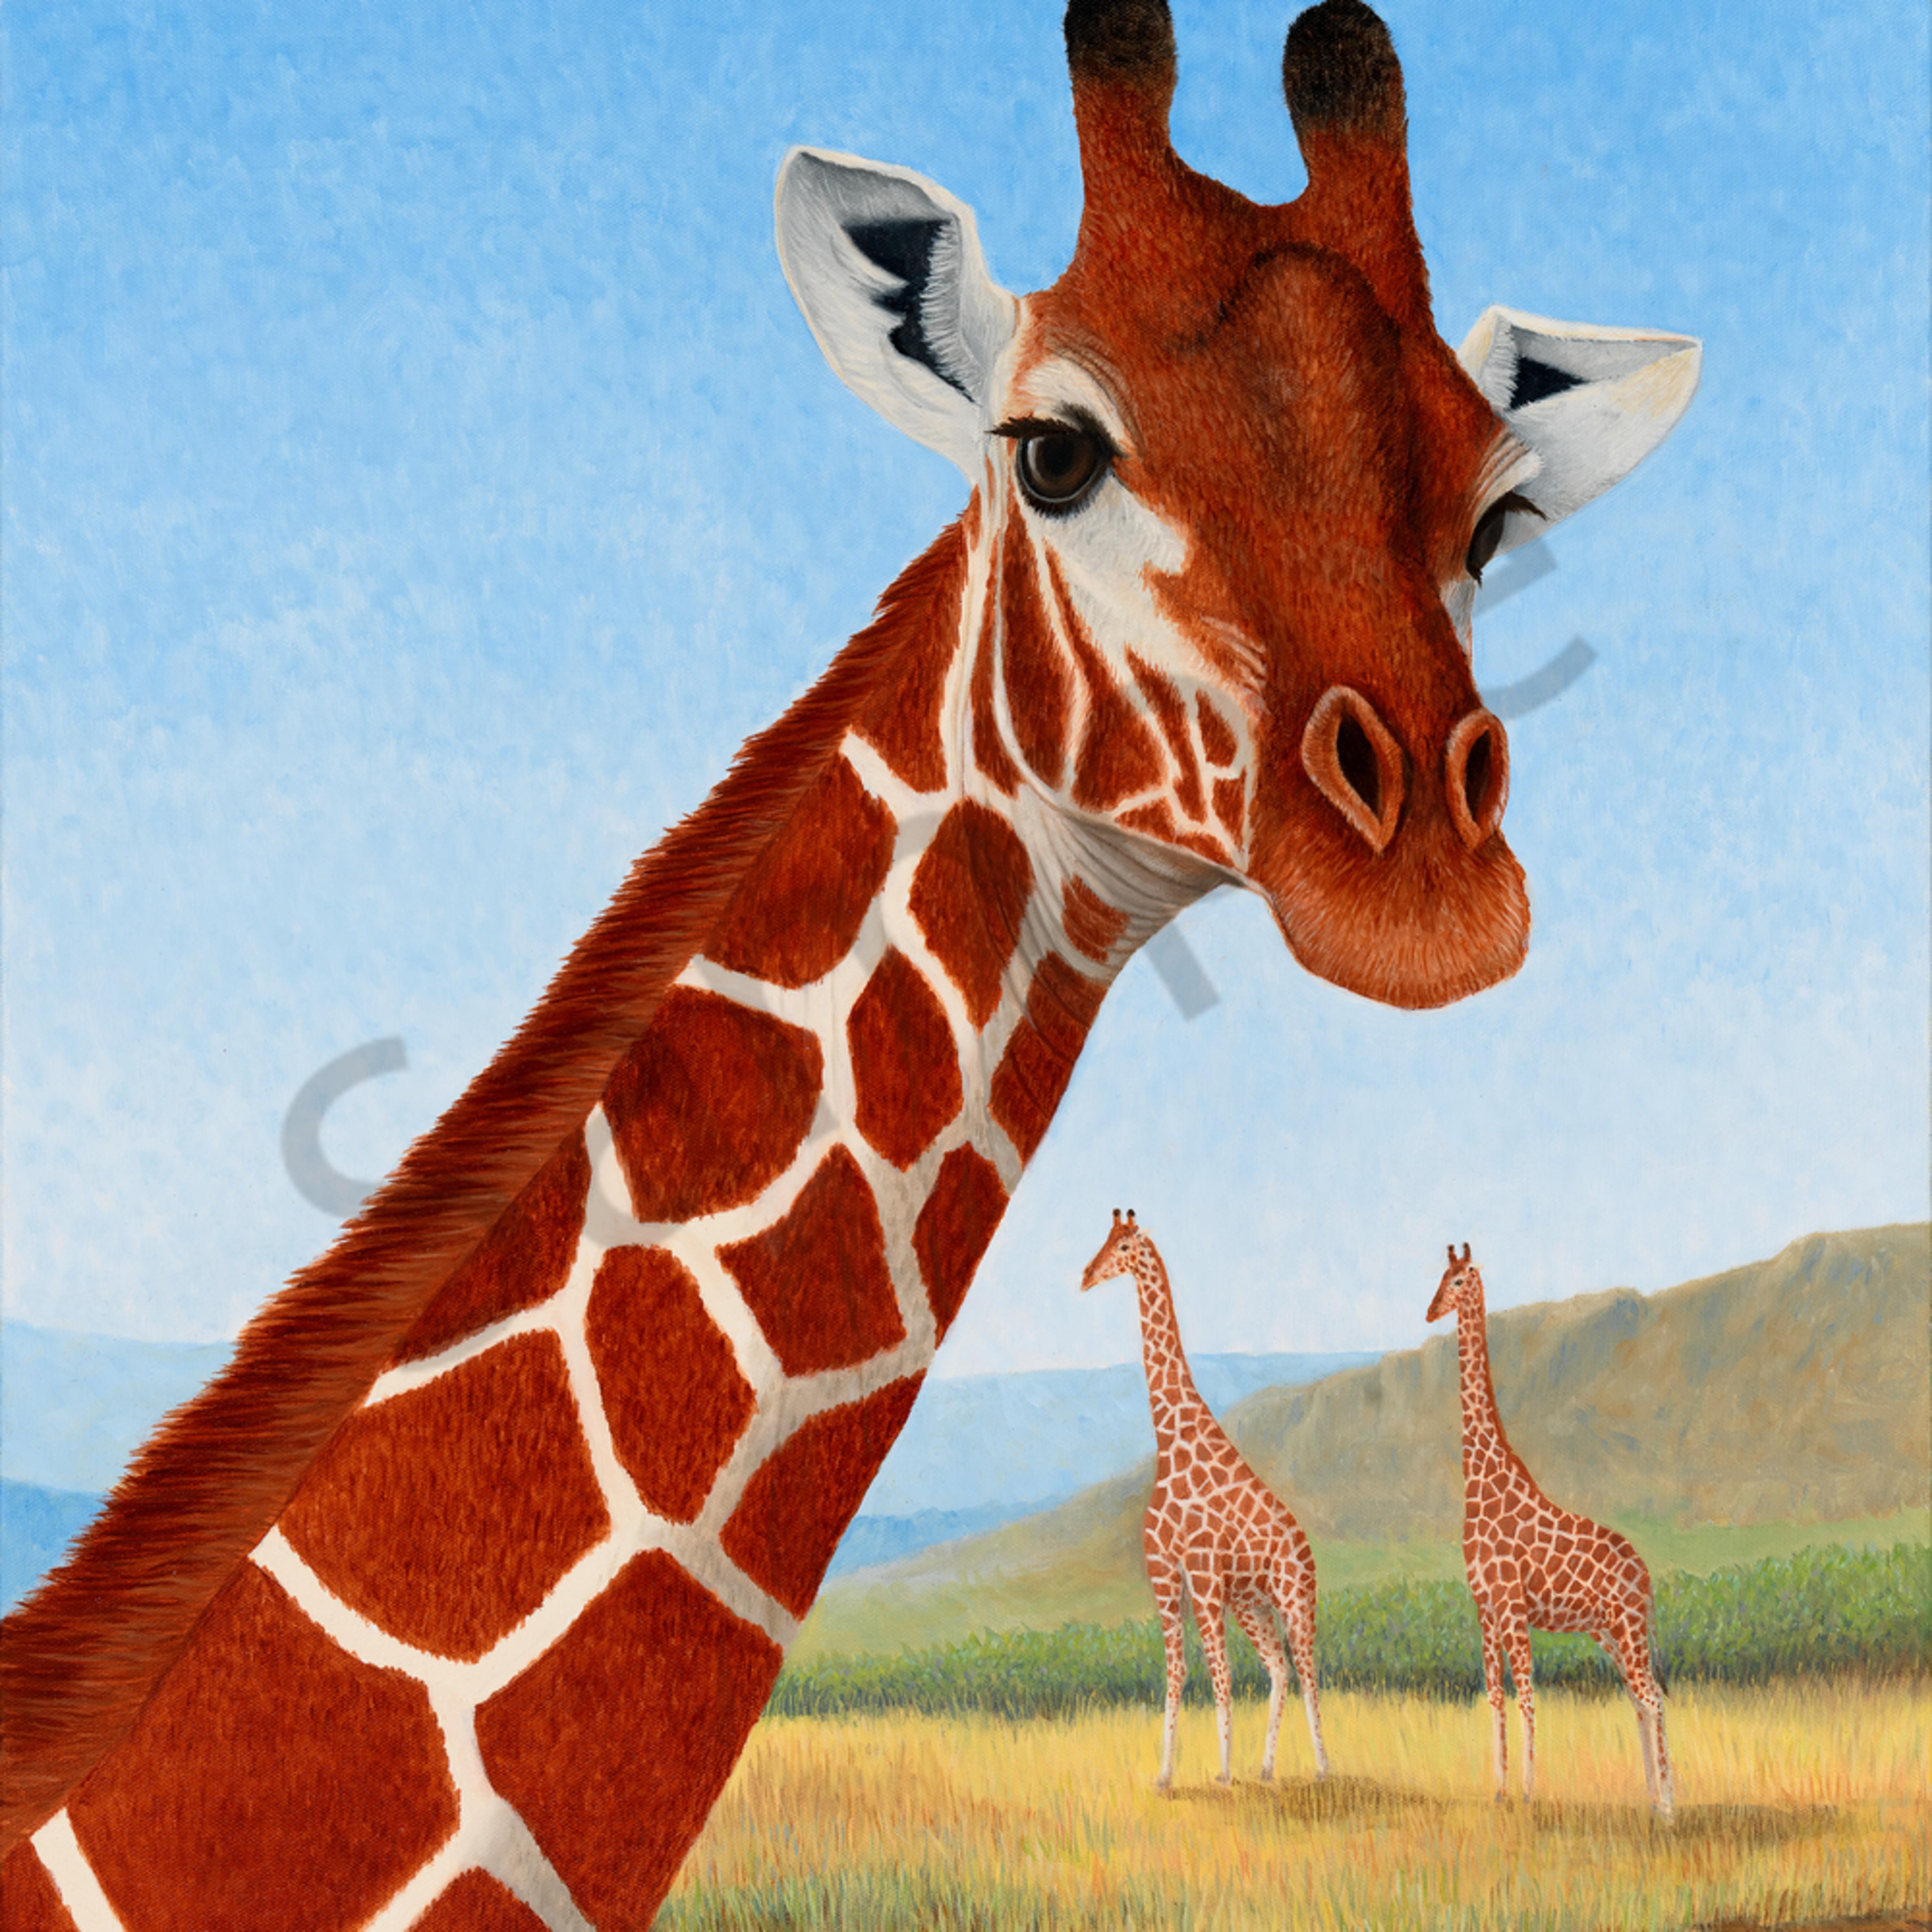 Giraffe asf mvcjnw